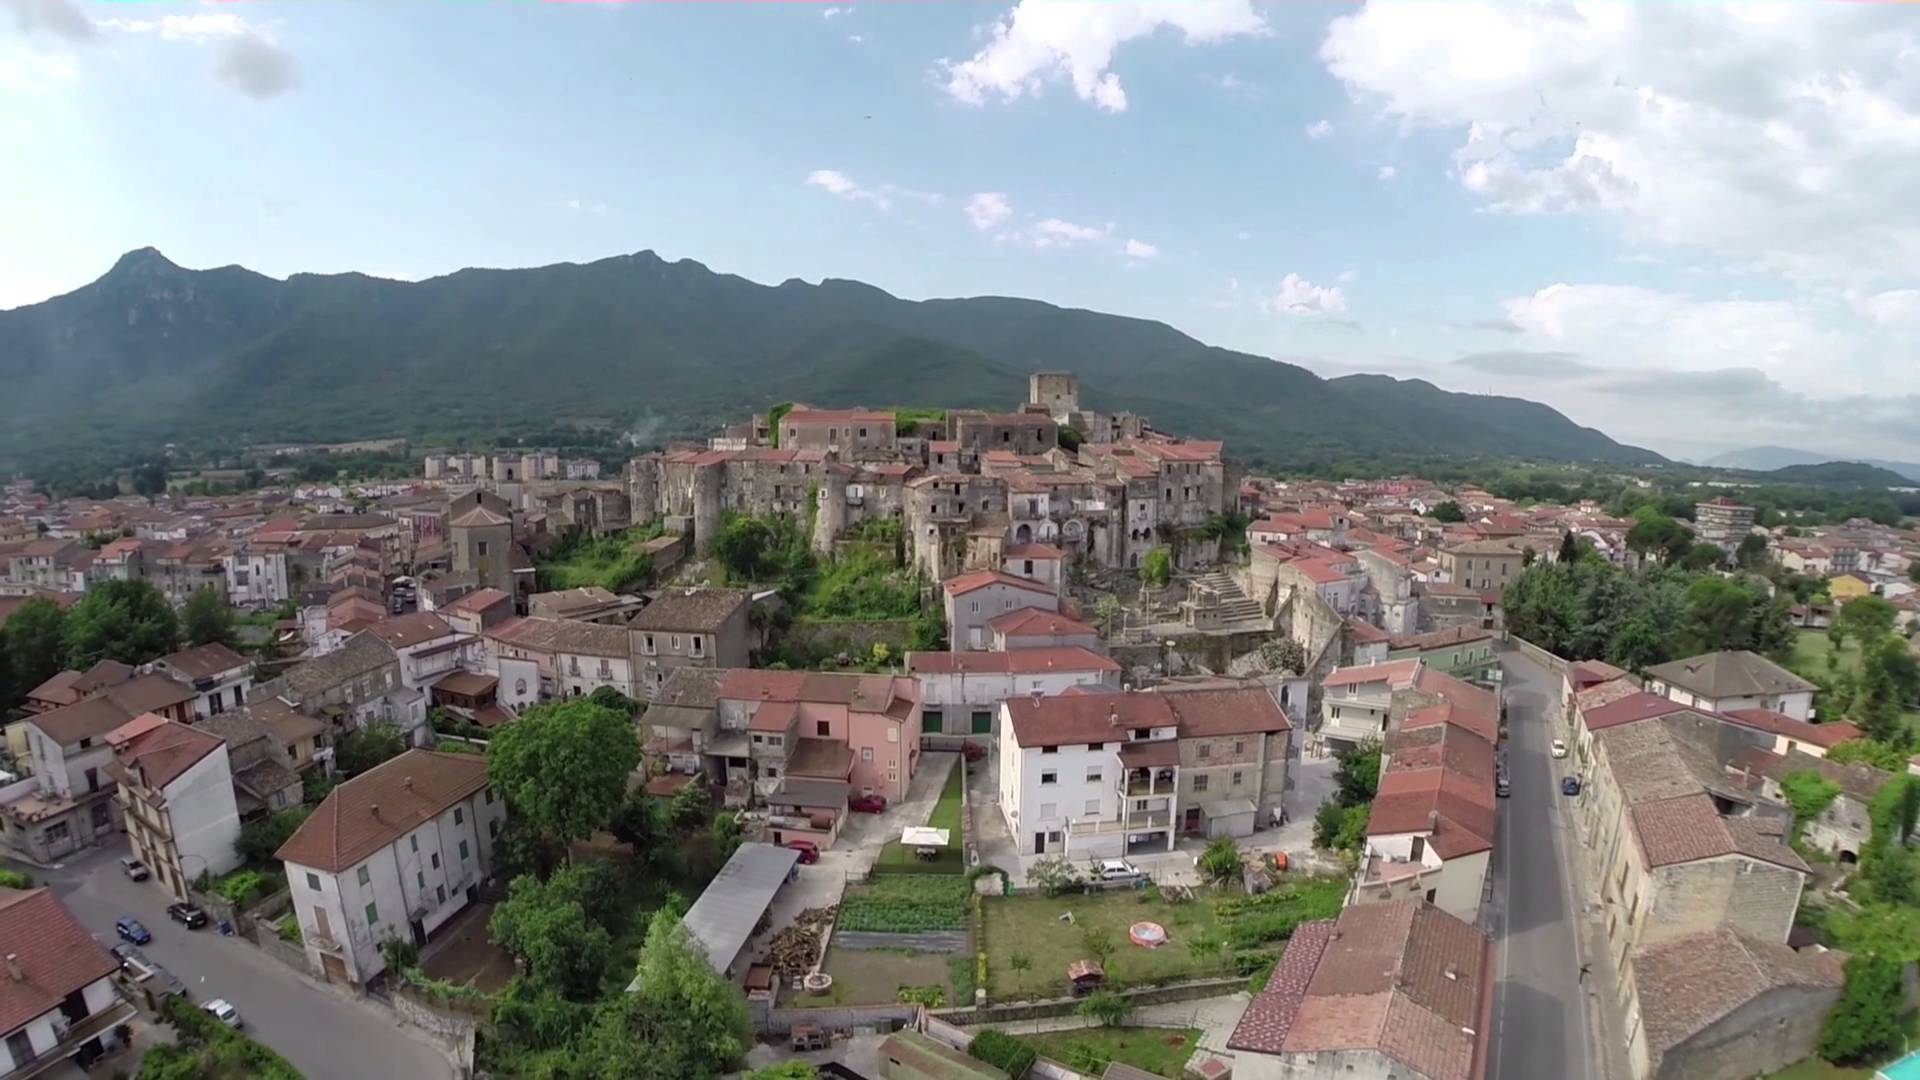 Veduta aerea del borgo